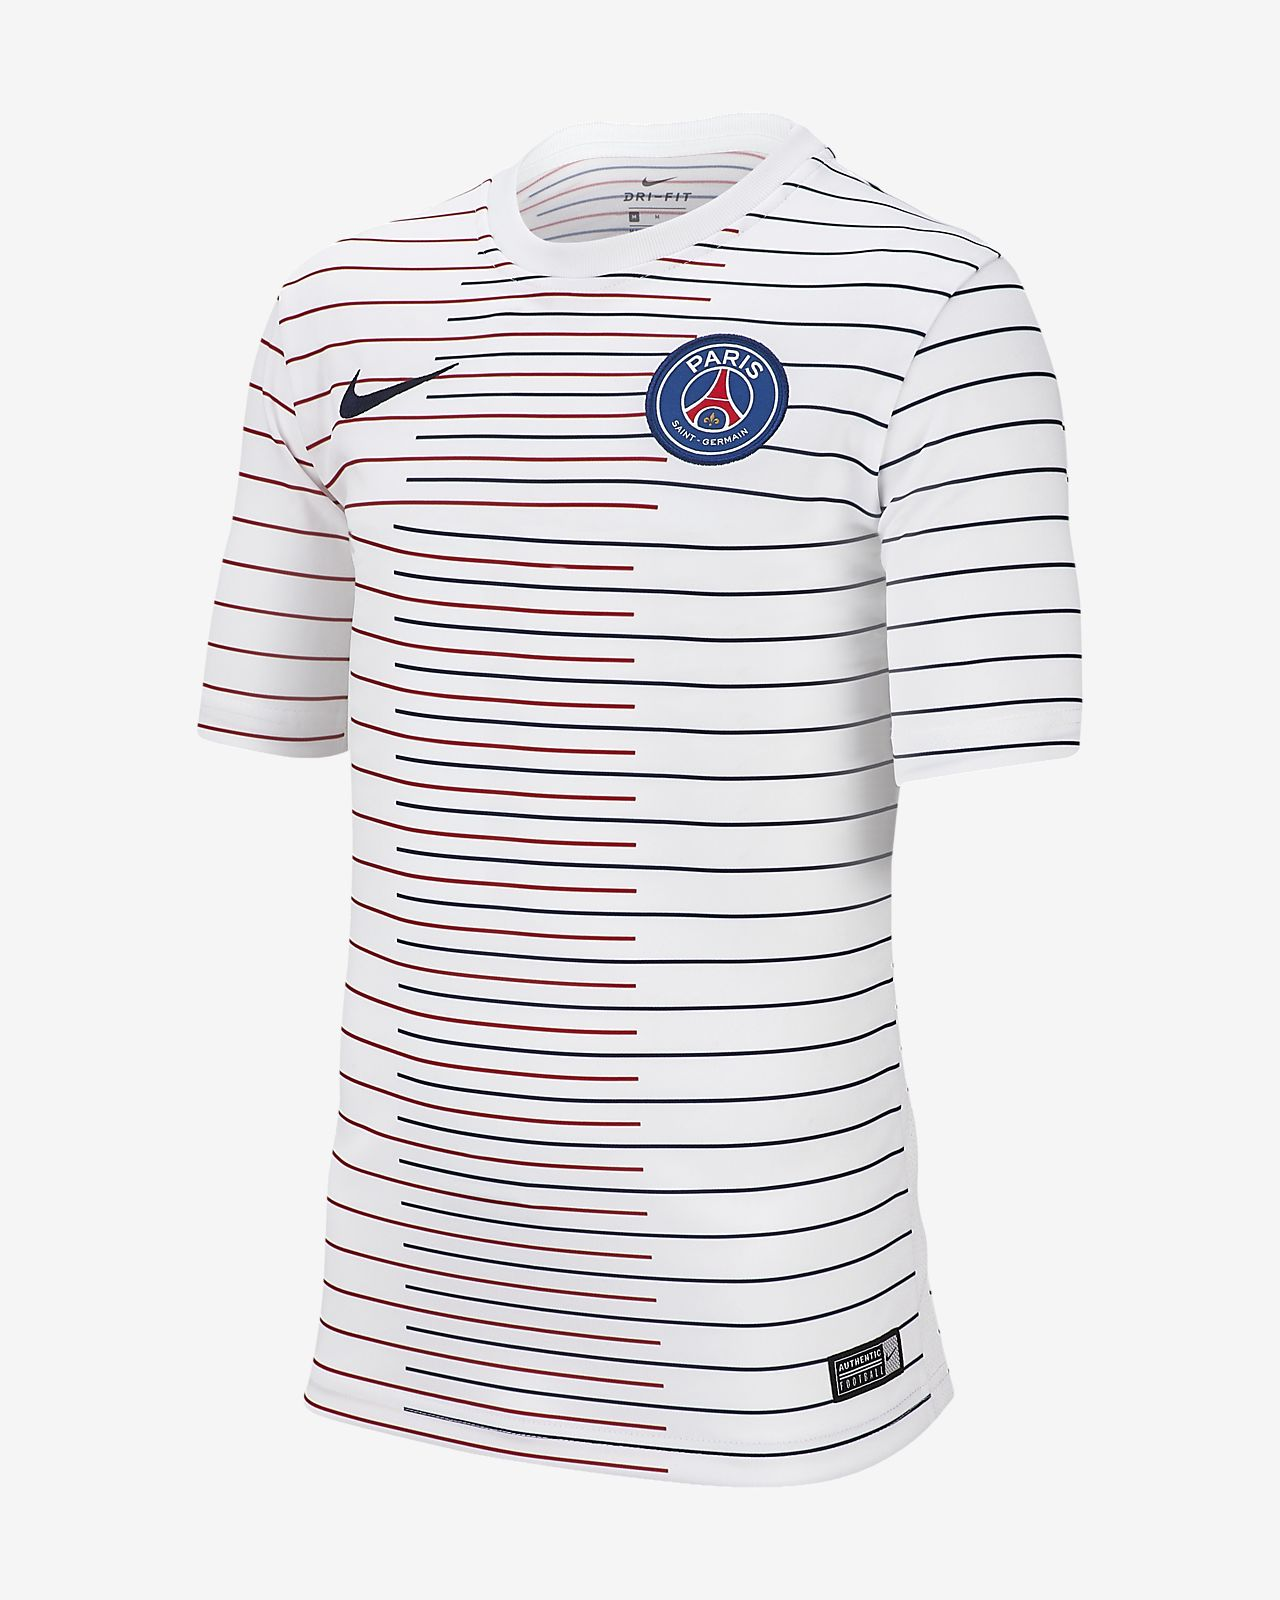 Prenda para la parte superior de fútbol de manga corta para niños talla grande Nike Dri-FIT Paris Saint-Germain